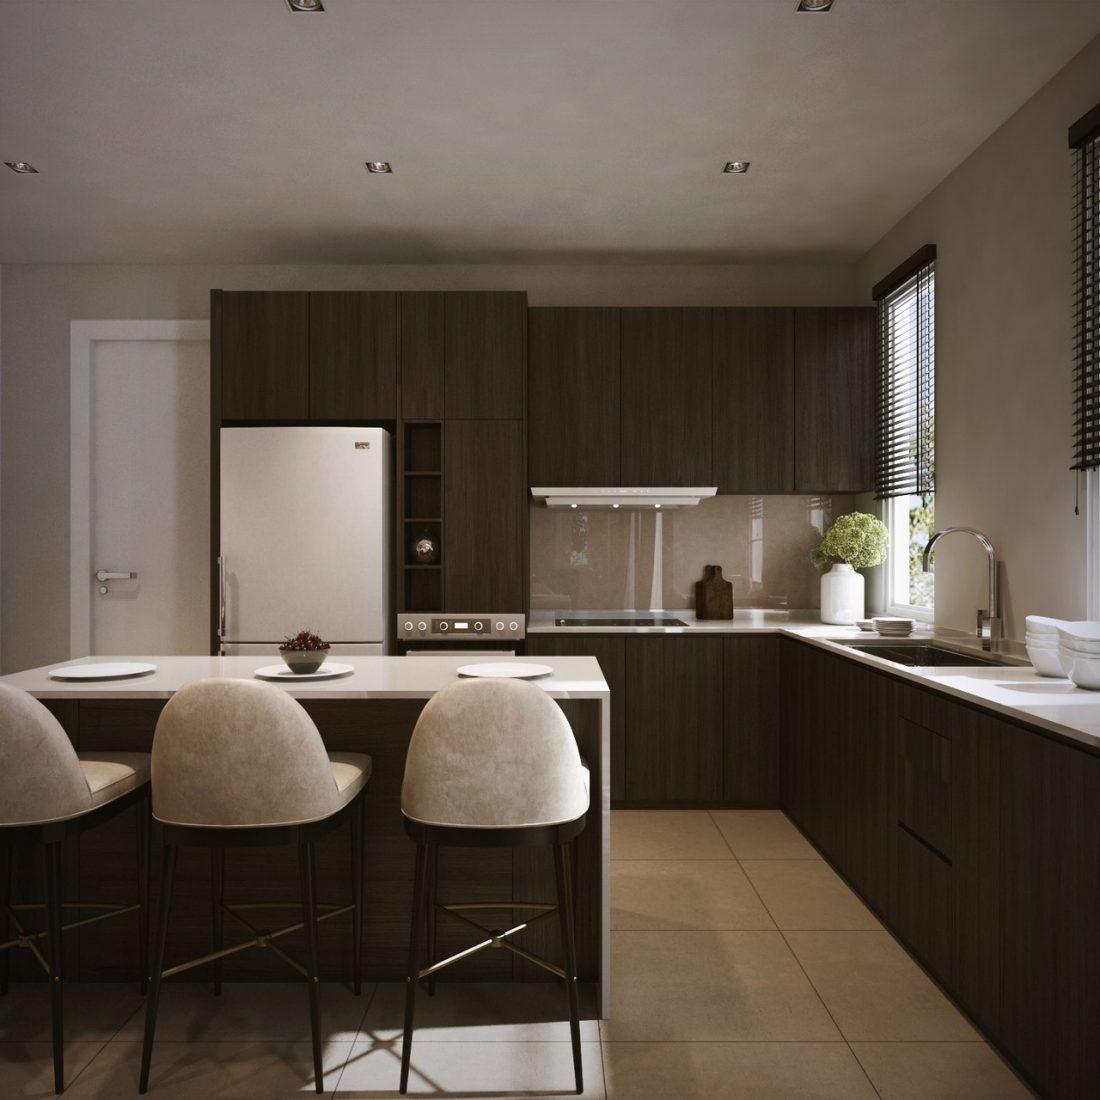 Sa Kitchen Designs: Masculine Interior Design